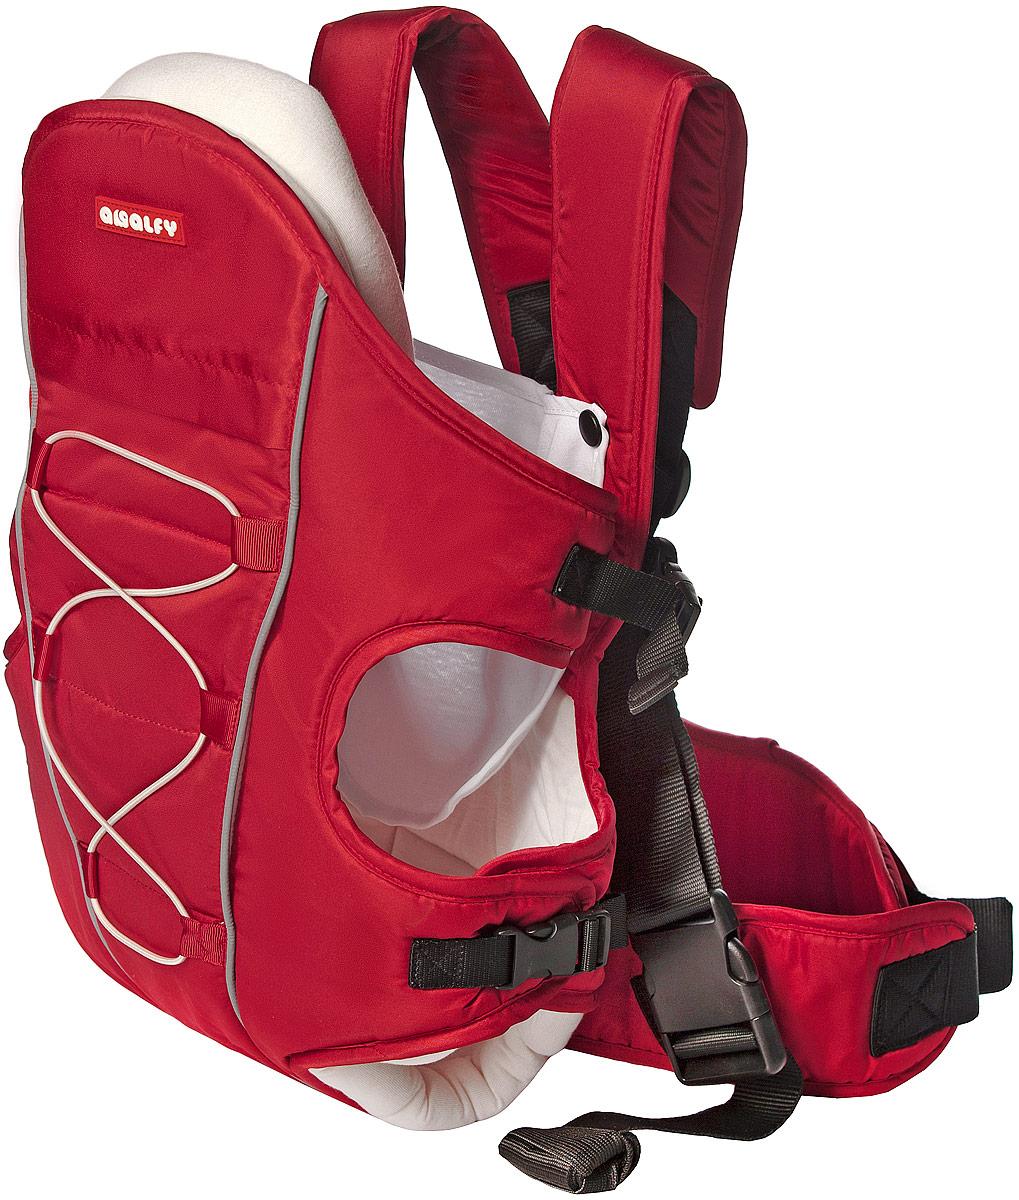 Happy Baby Рюкзак-переноска Amalfy цвет красный GB-809 -  Рюкзаки, слинги, кенгуру